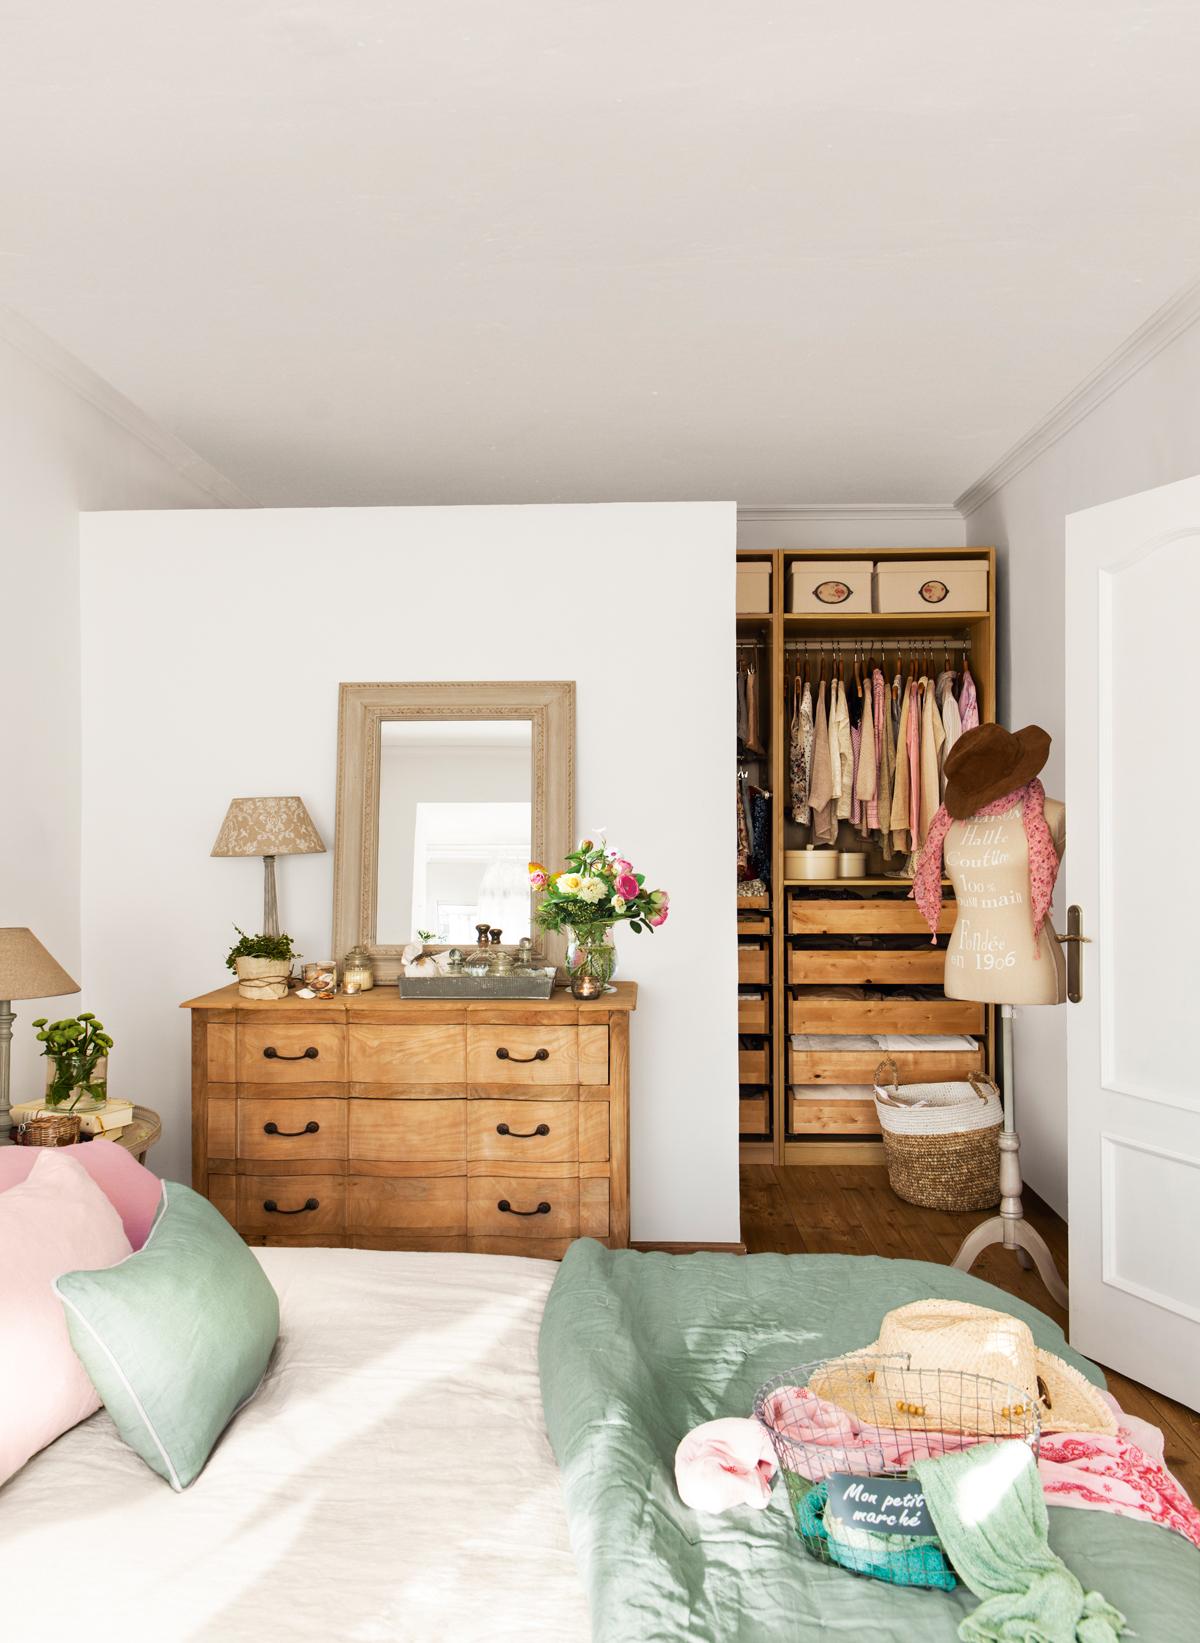 50 dormitorios principales para coger ideas for Cuartos decorados azul